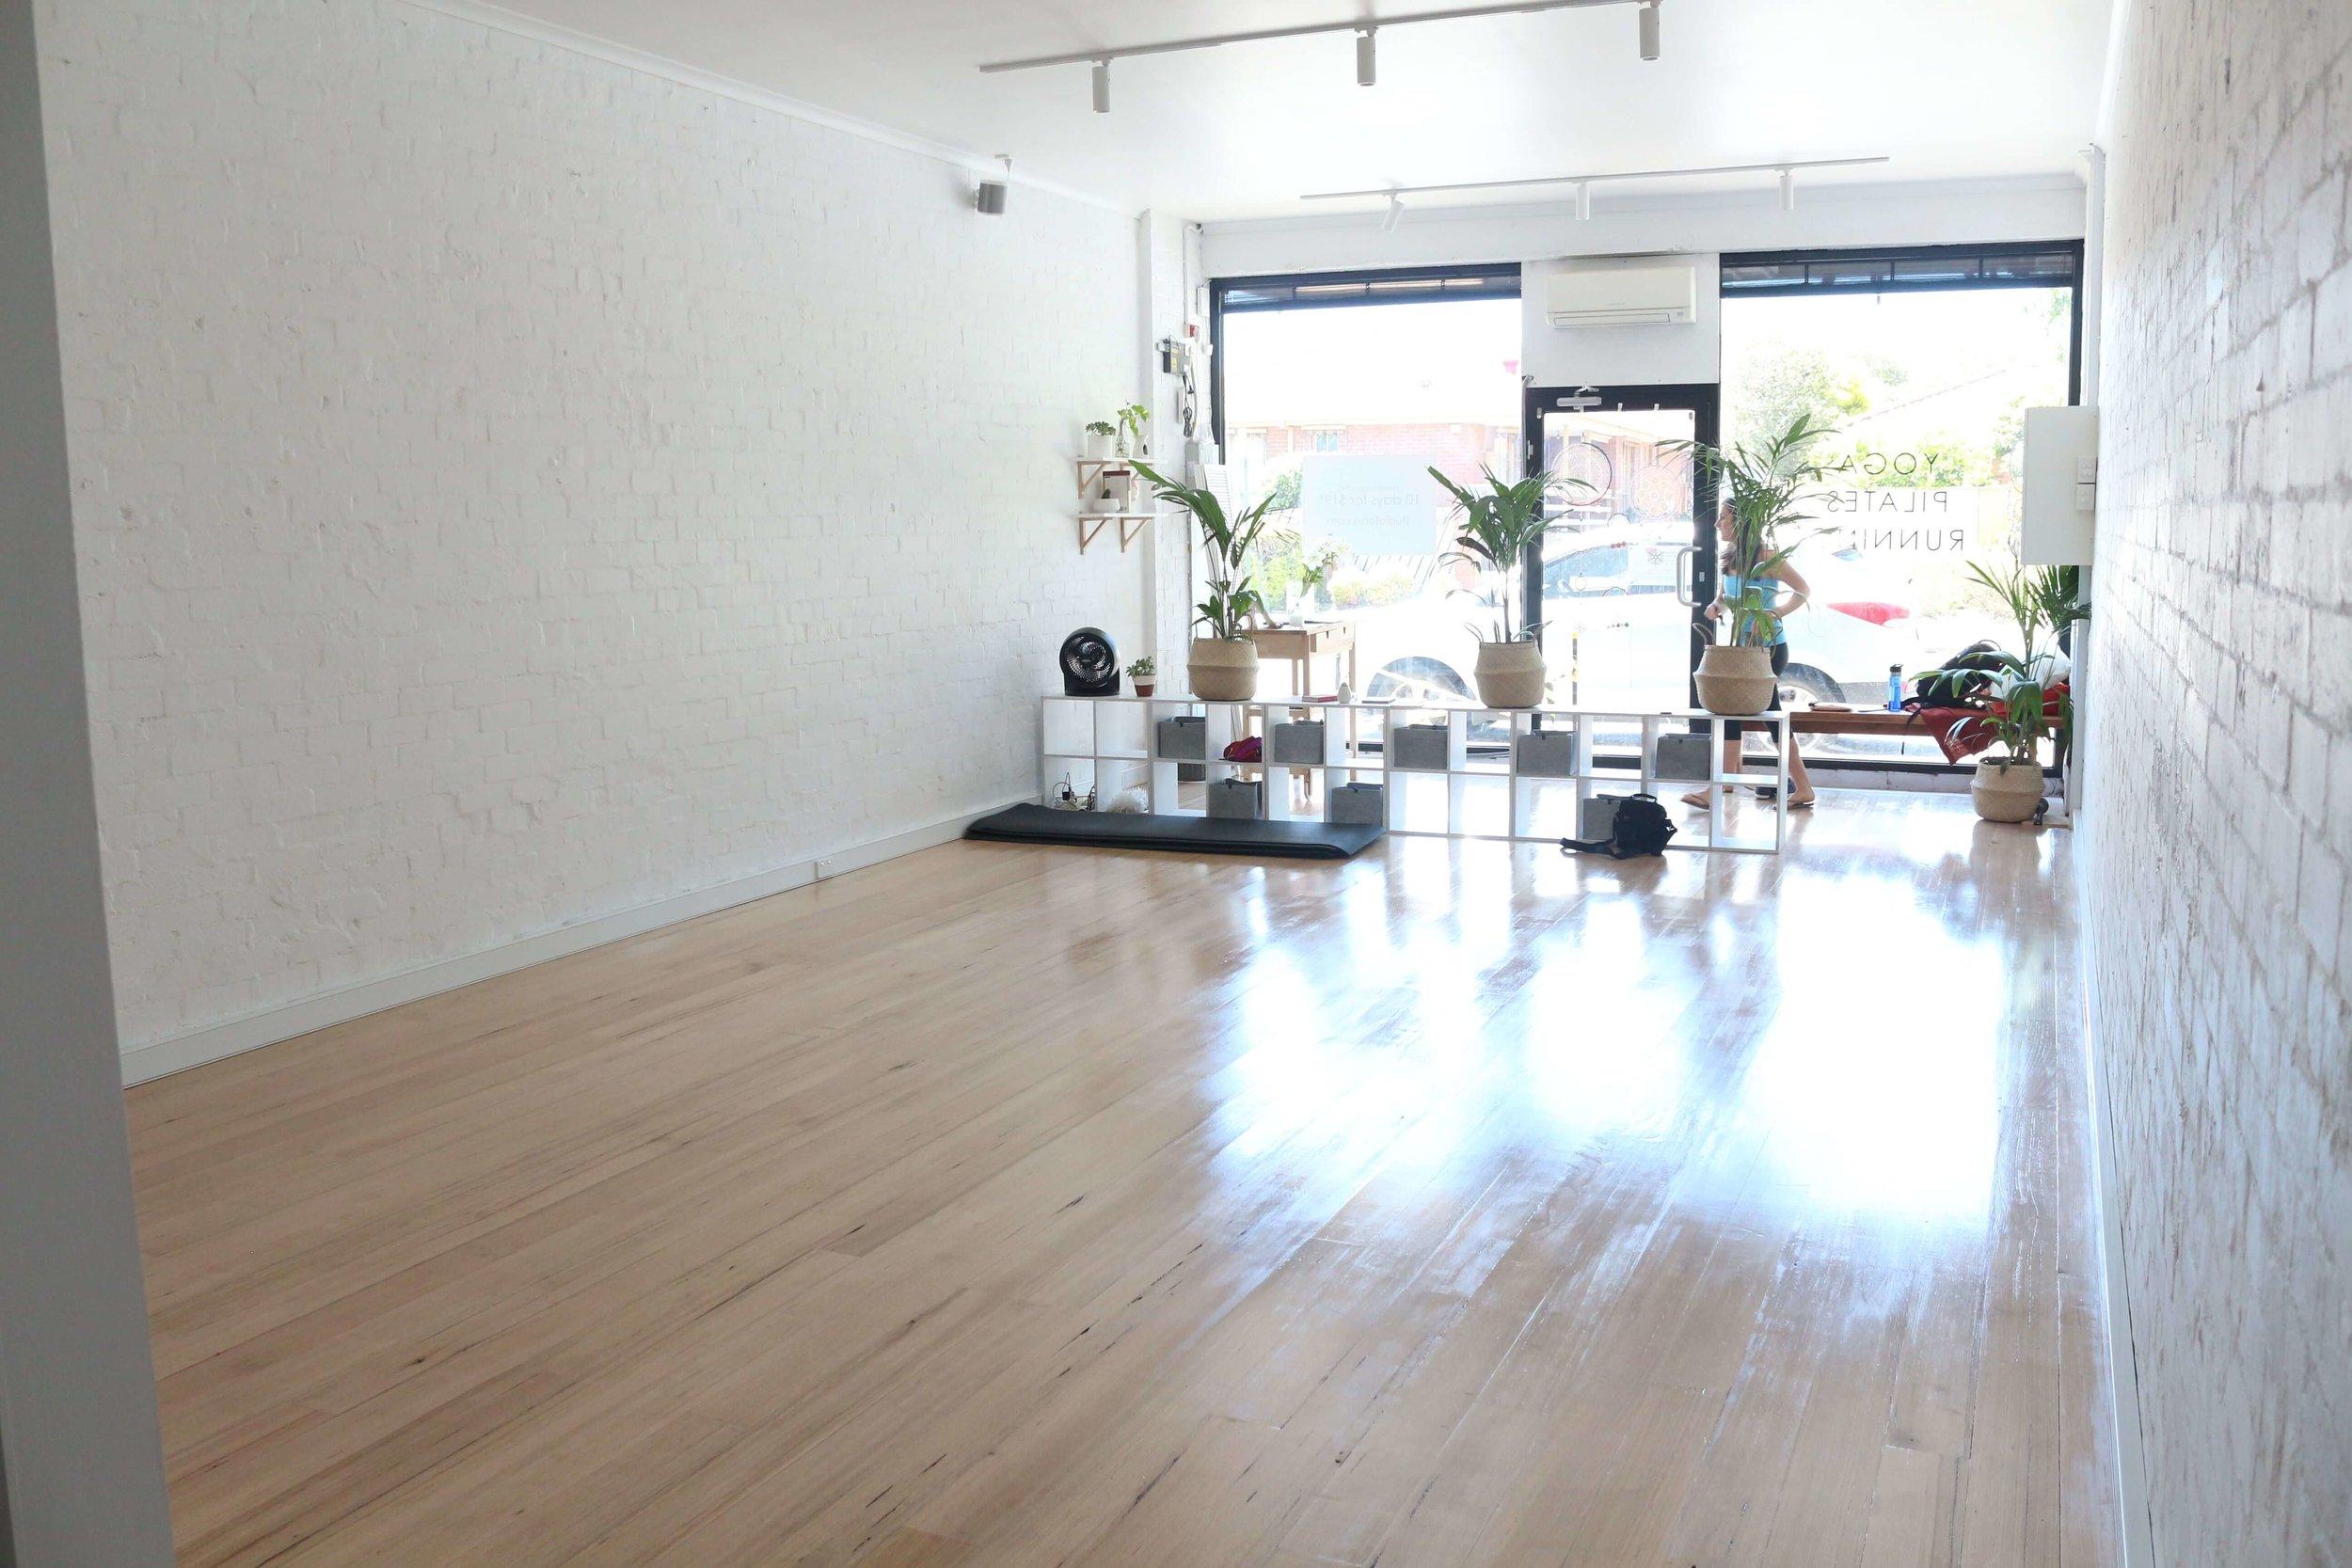 A bright, warm studio just a short drive from Ringwood. - STUDIO TORUS PILATES | PILATES NEAR RINGWOOD